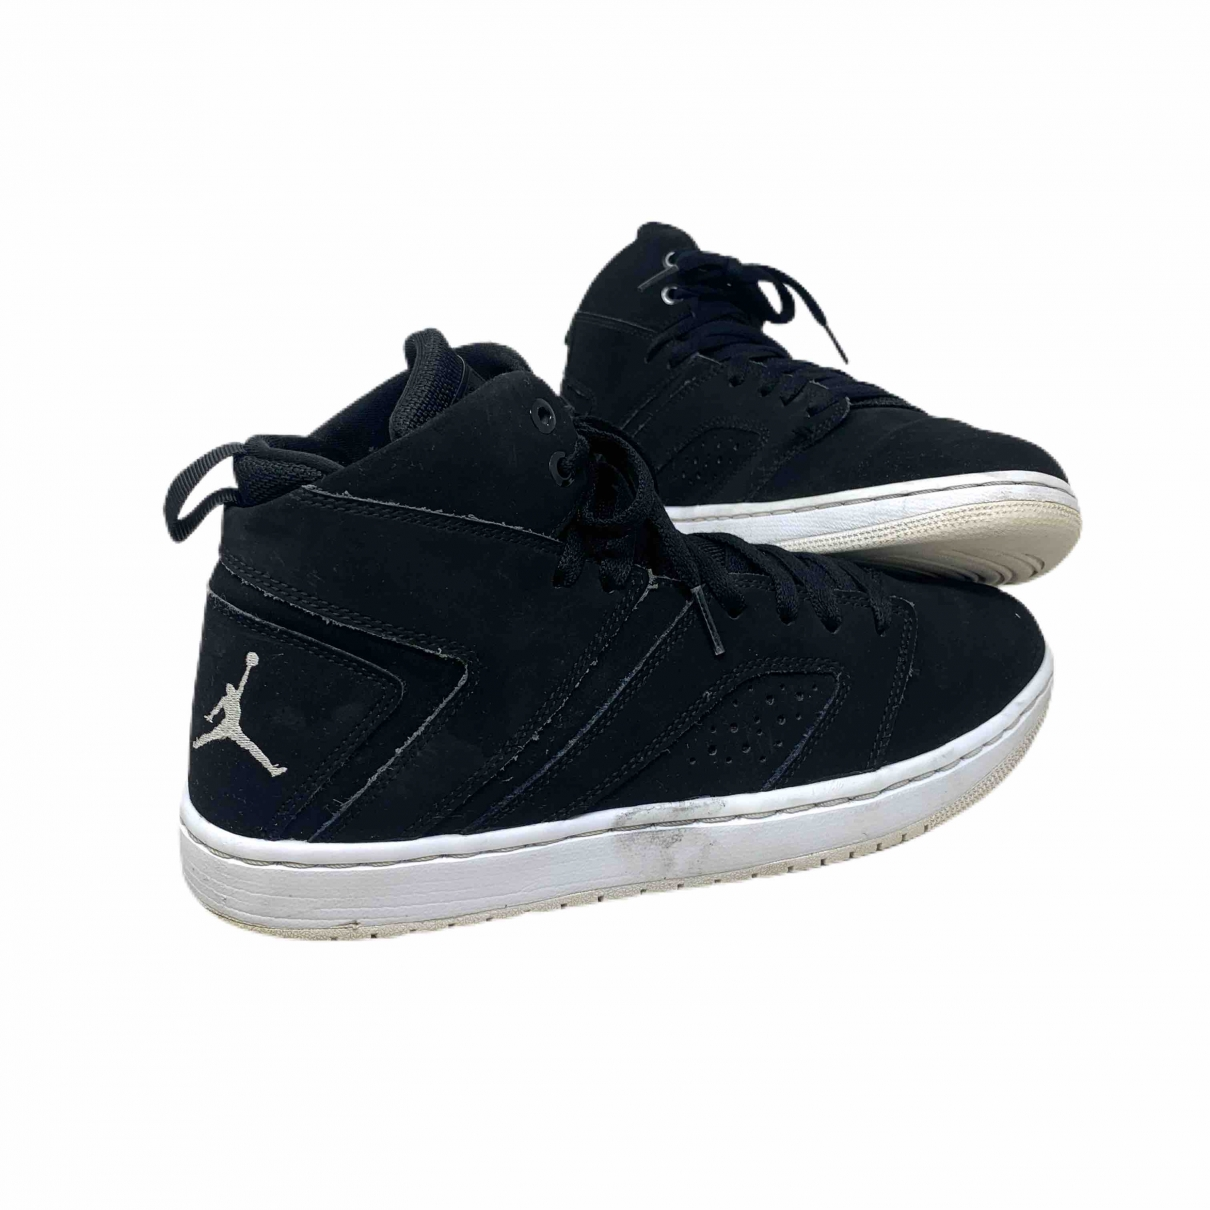 Jordan \N Sneakers in  Schwarz Leinen